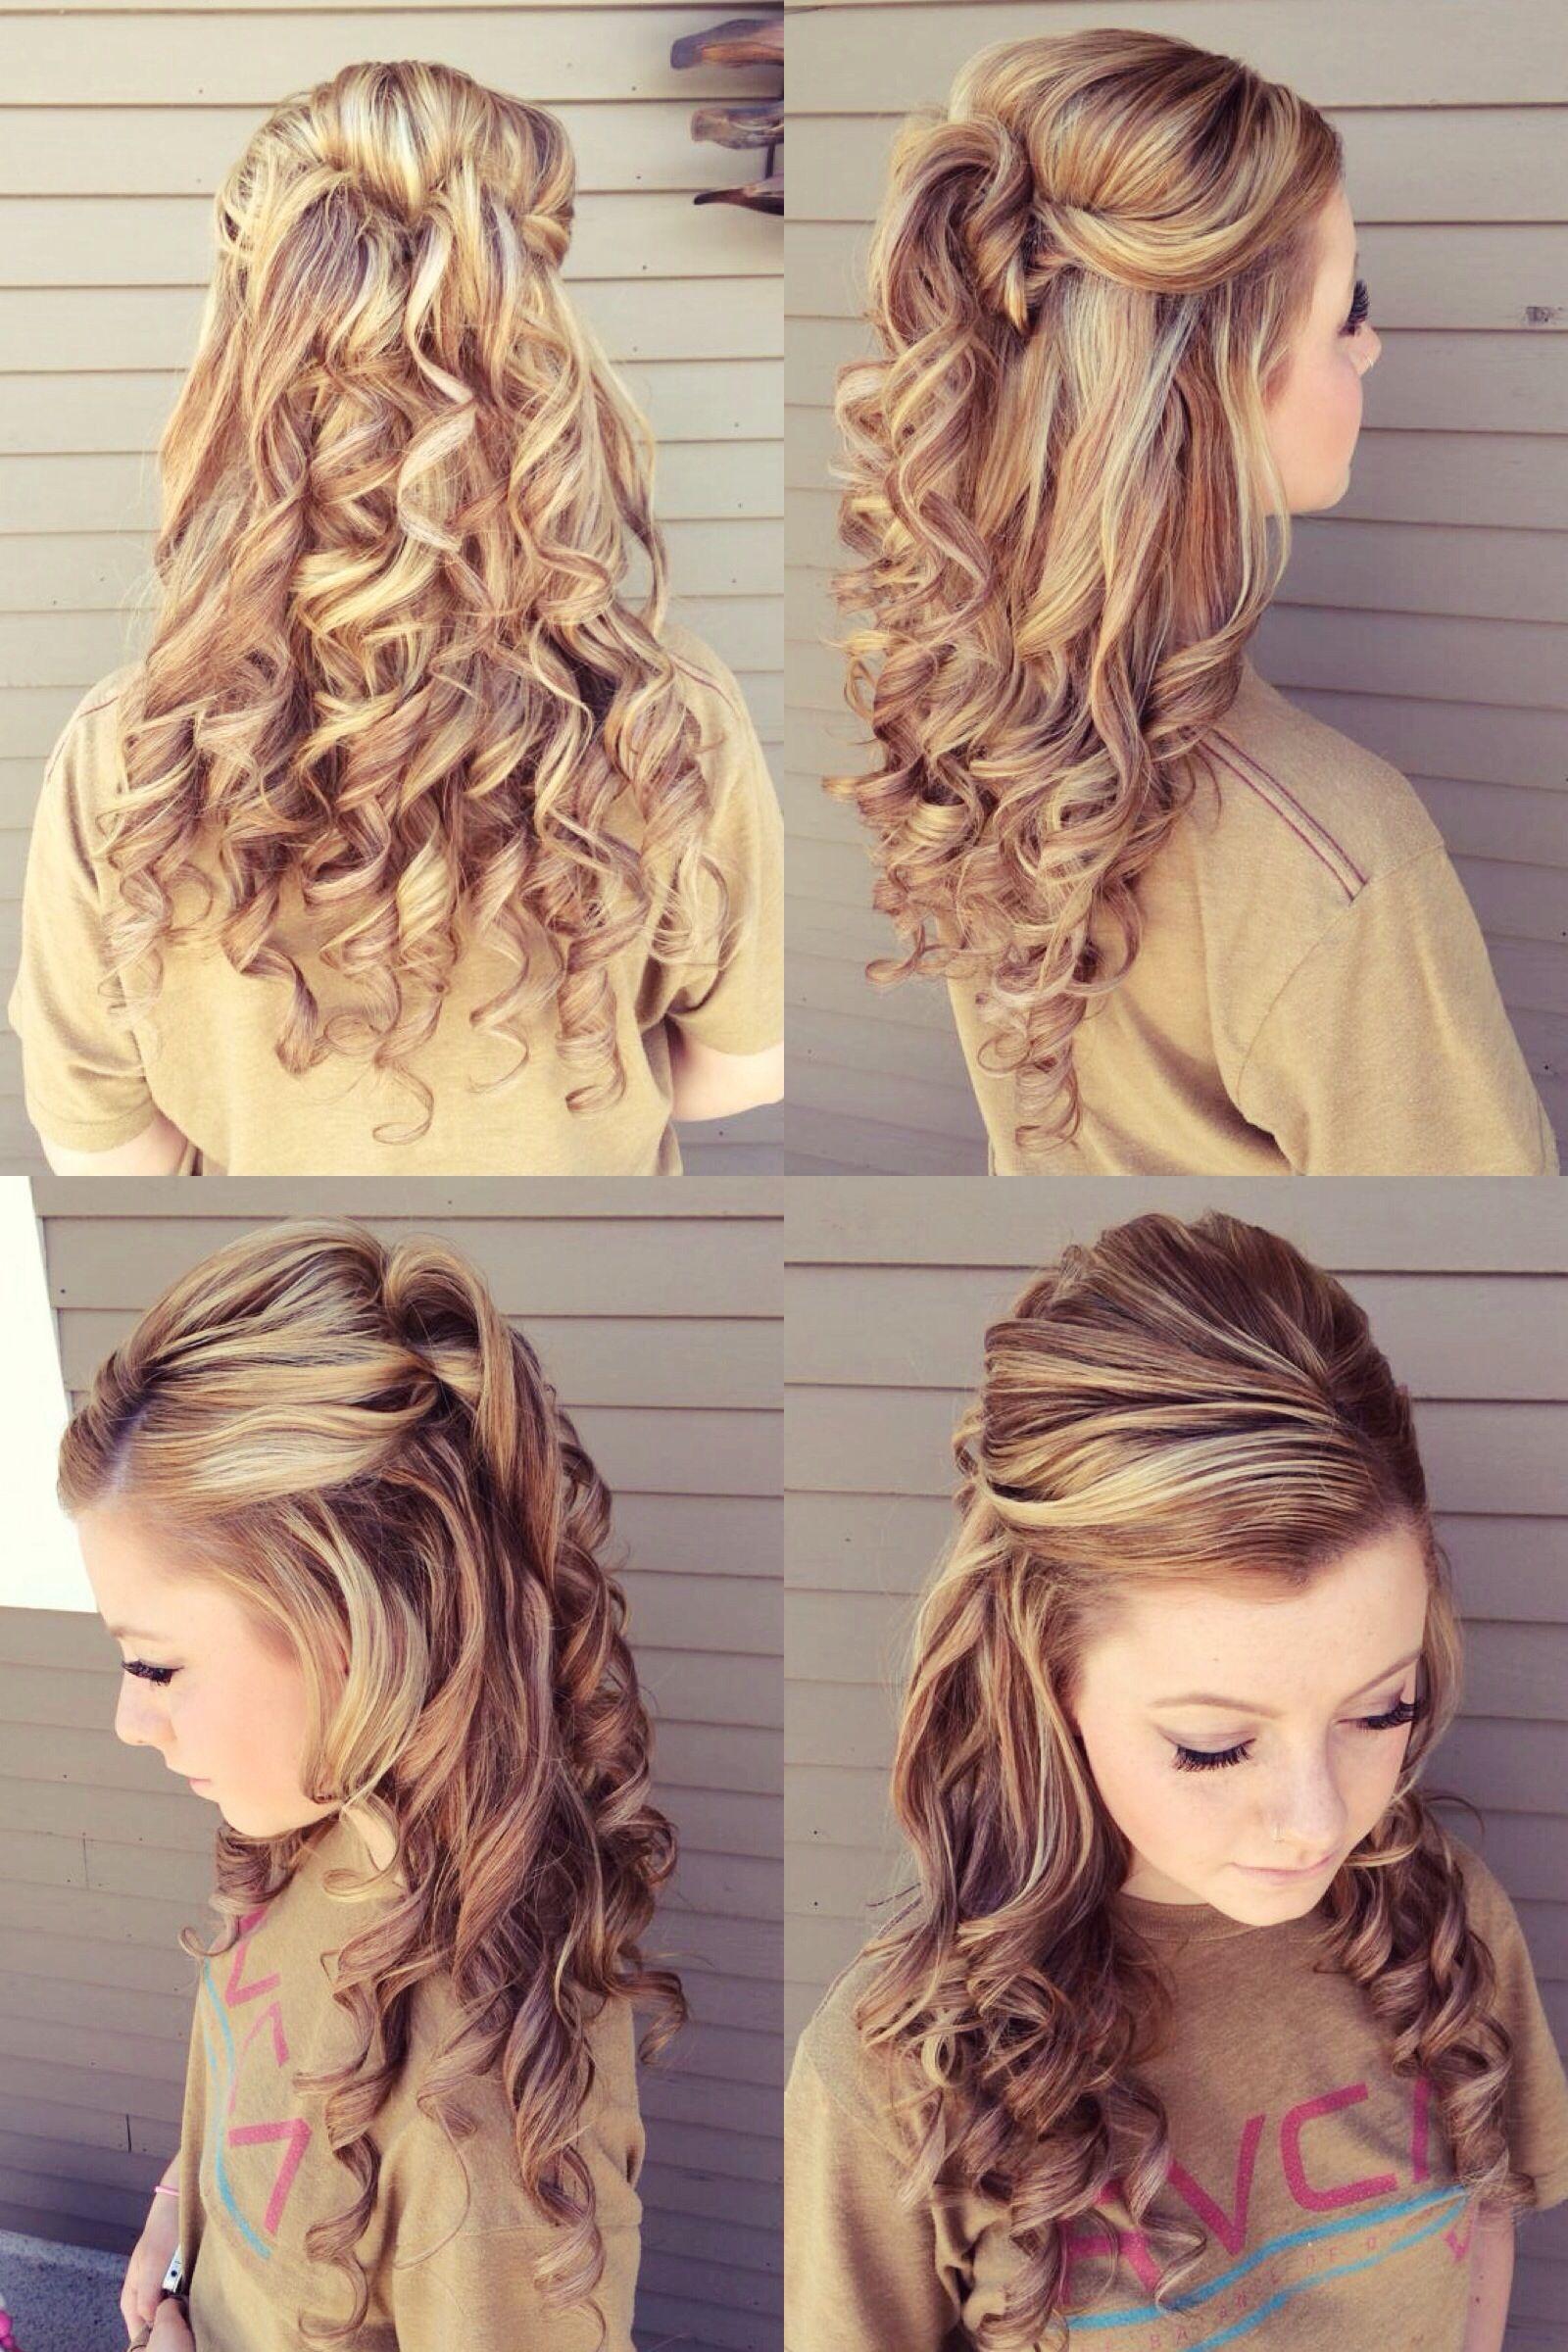 prom hair style, half up, half down. my hairdresser added so much